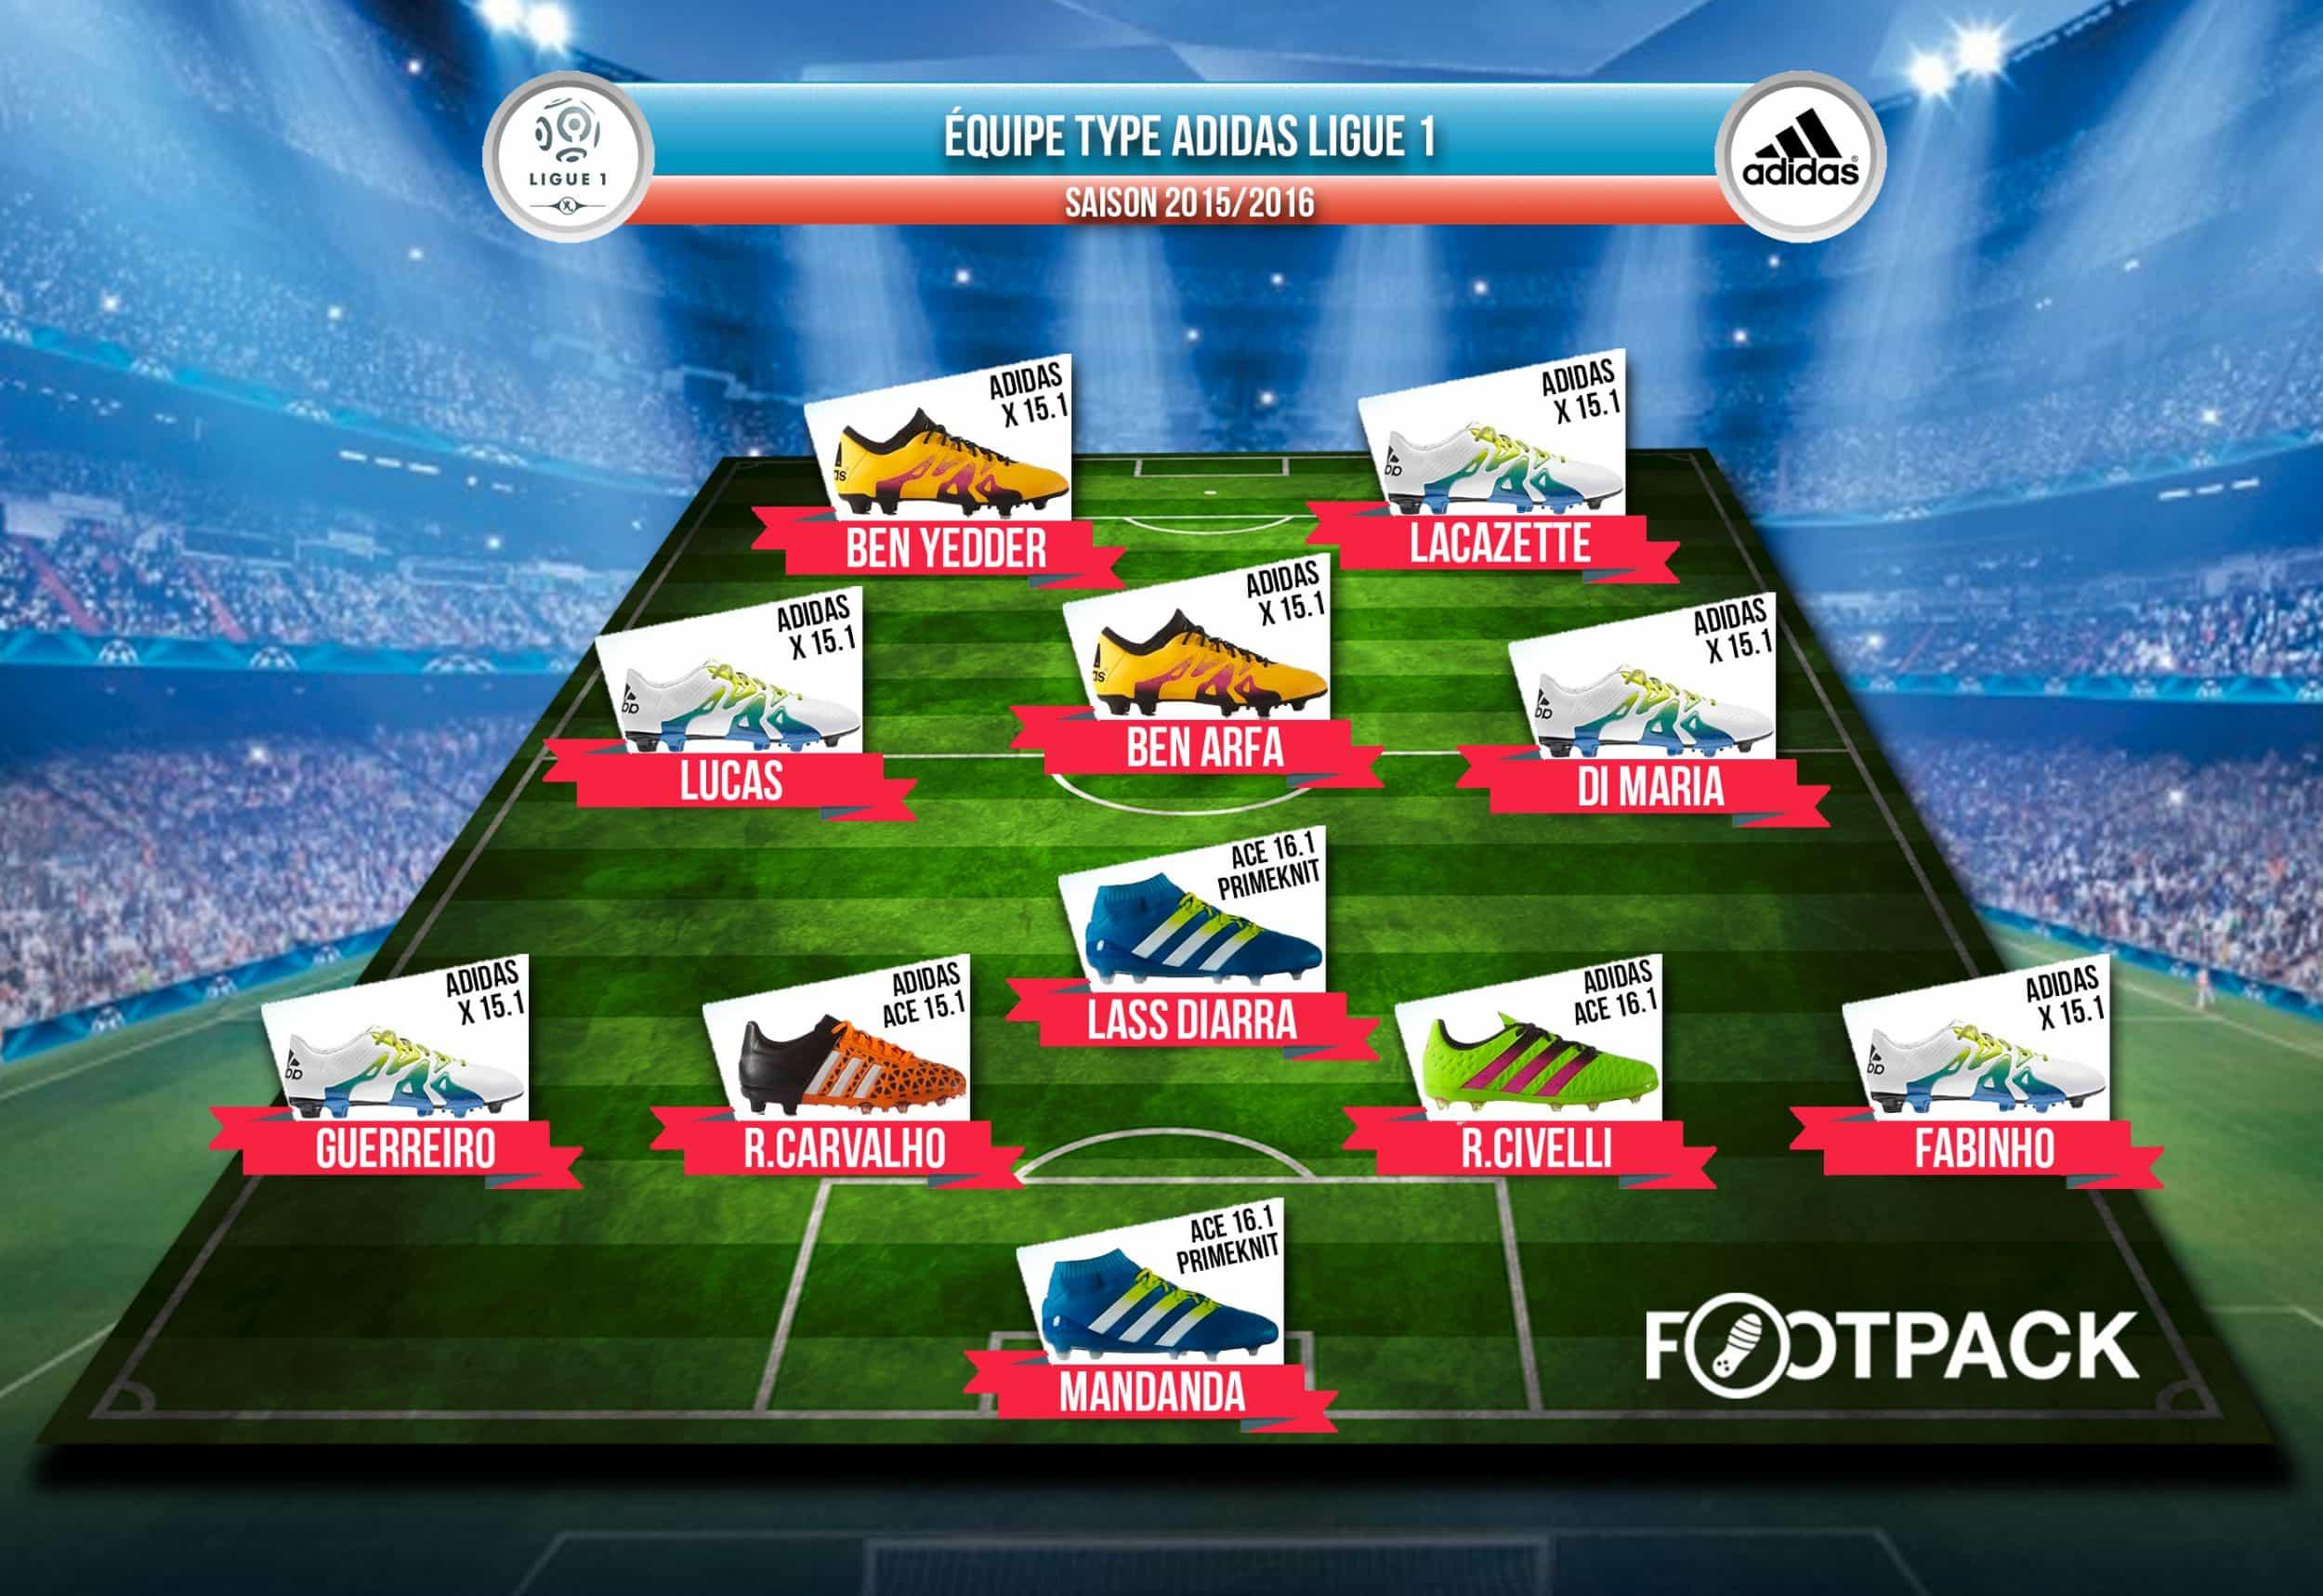 equipe-type-adidas-Ligue1-2015-2016